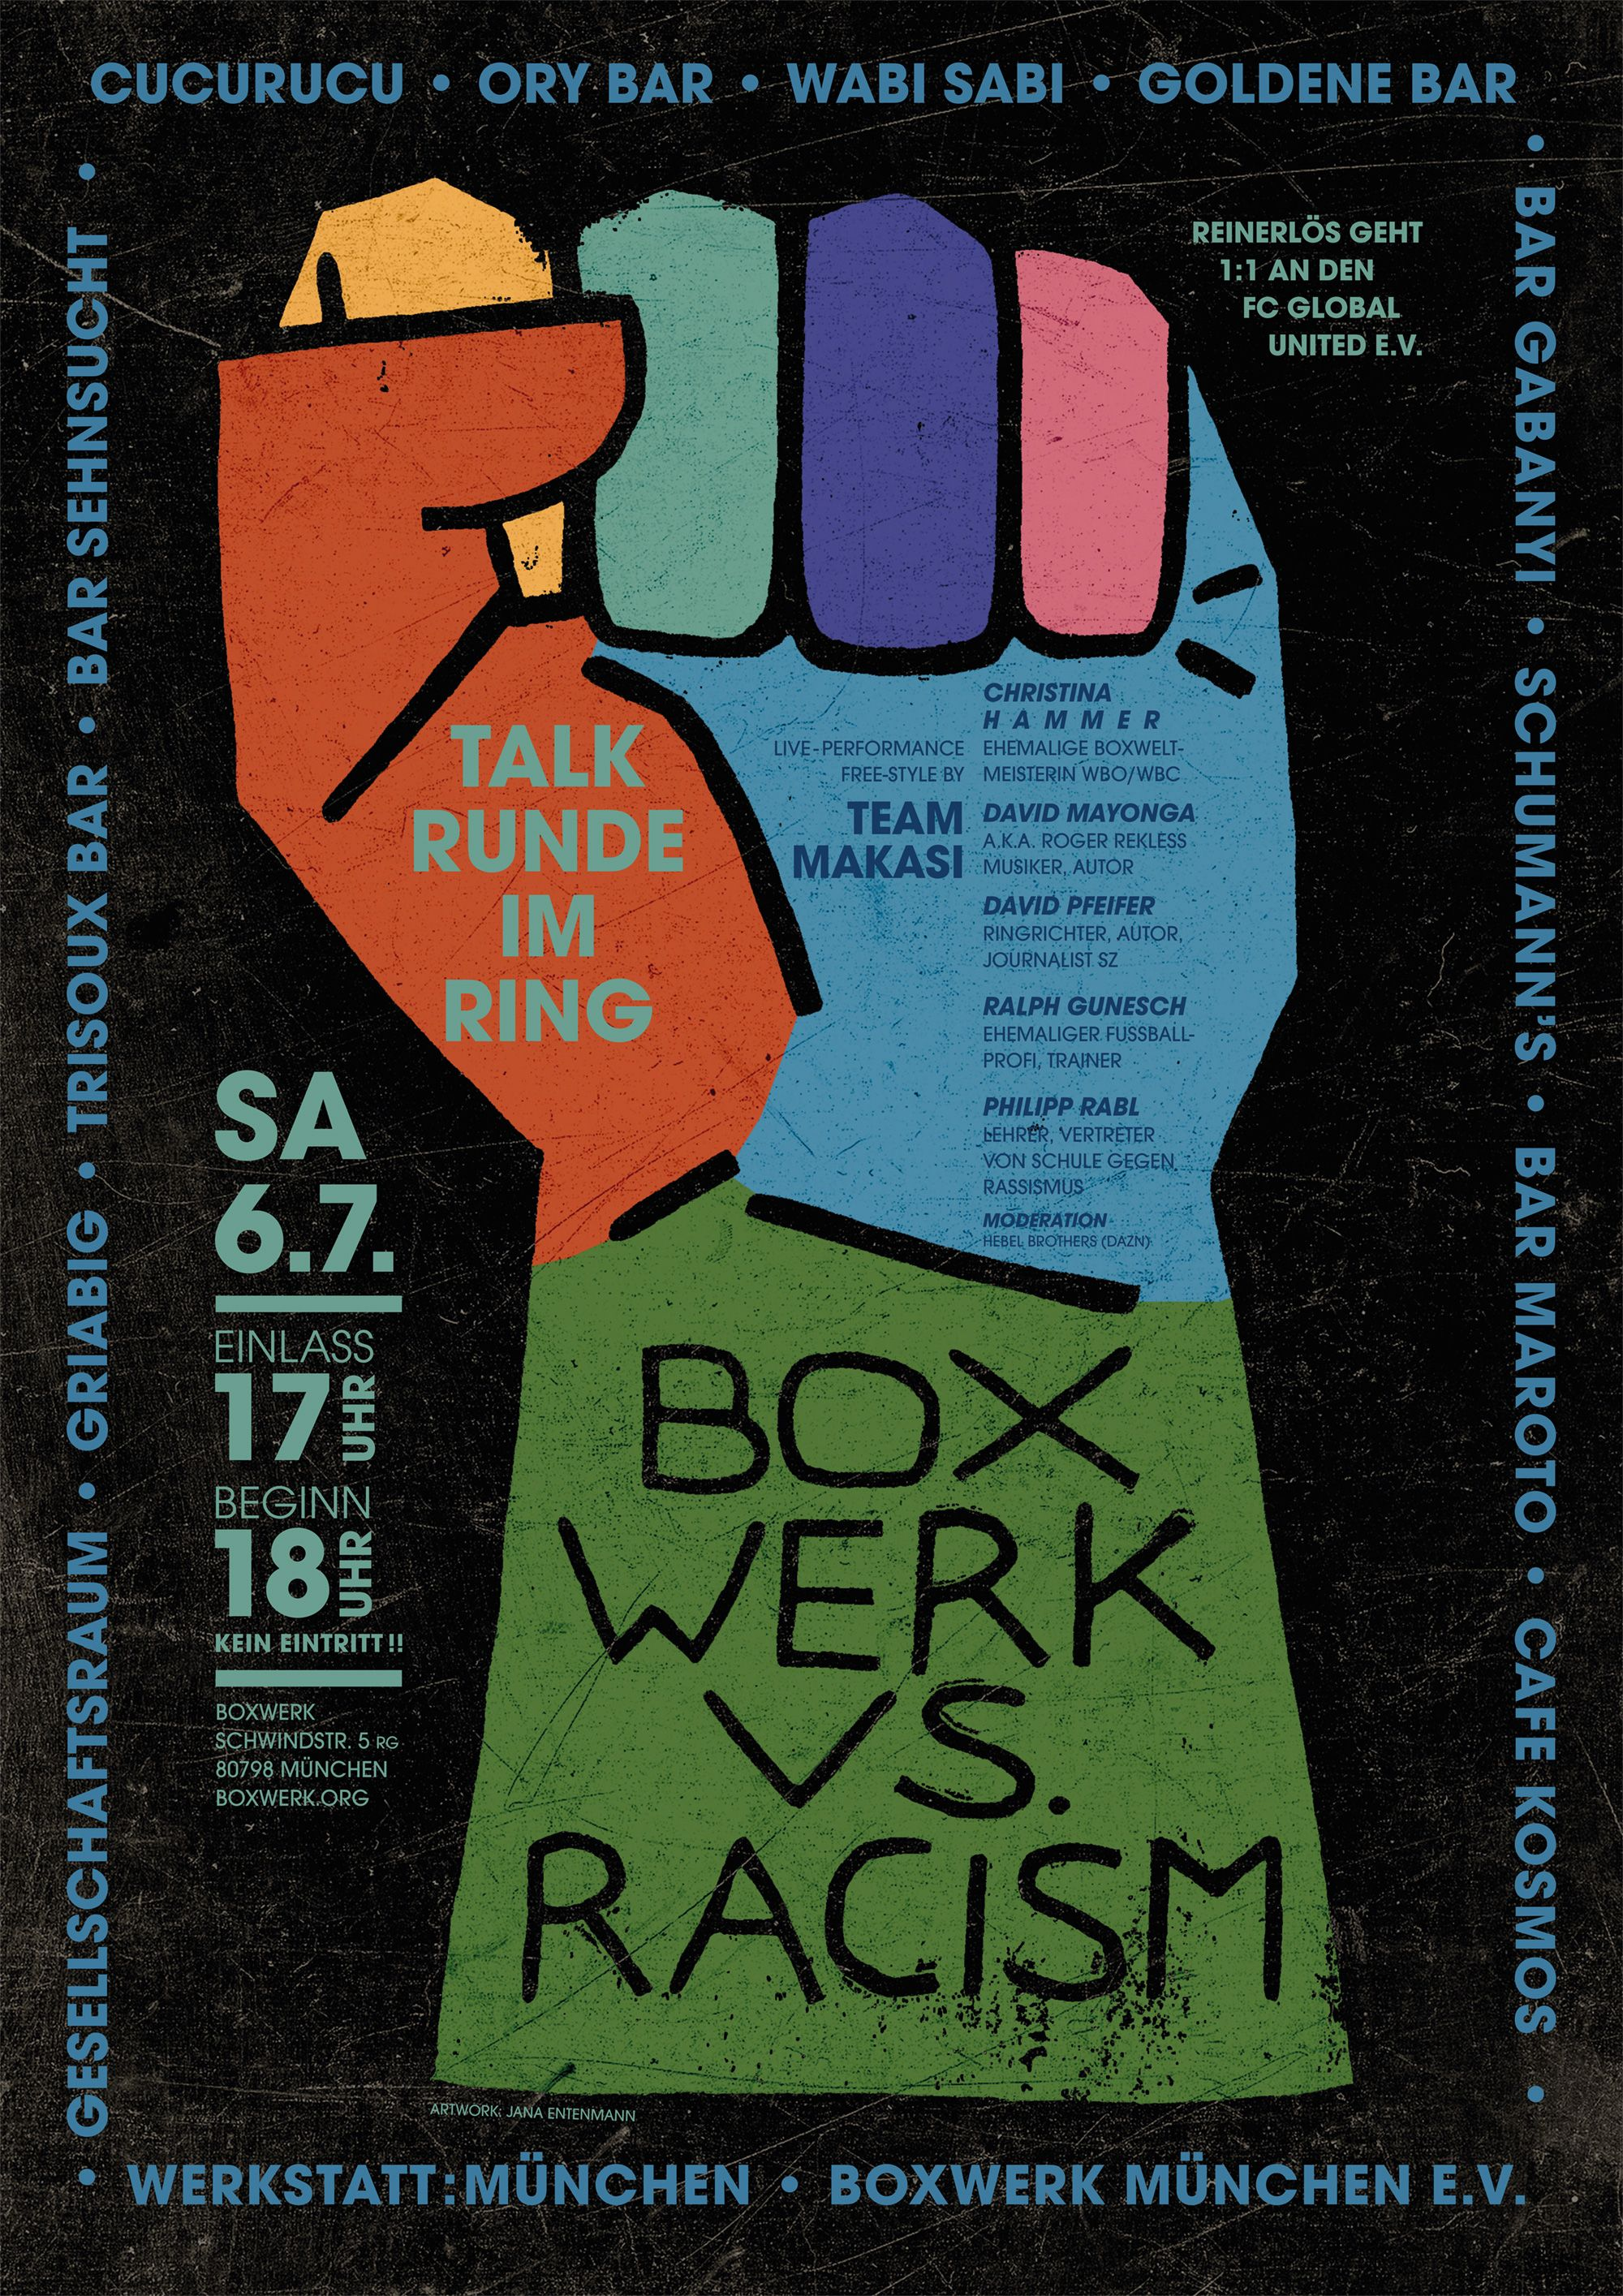 Bxw Against Racism Plakat